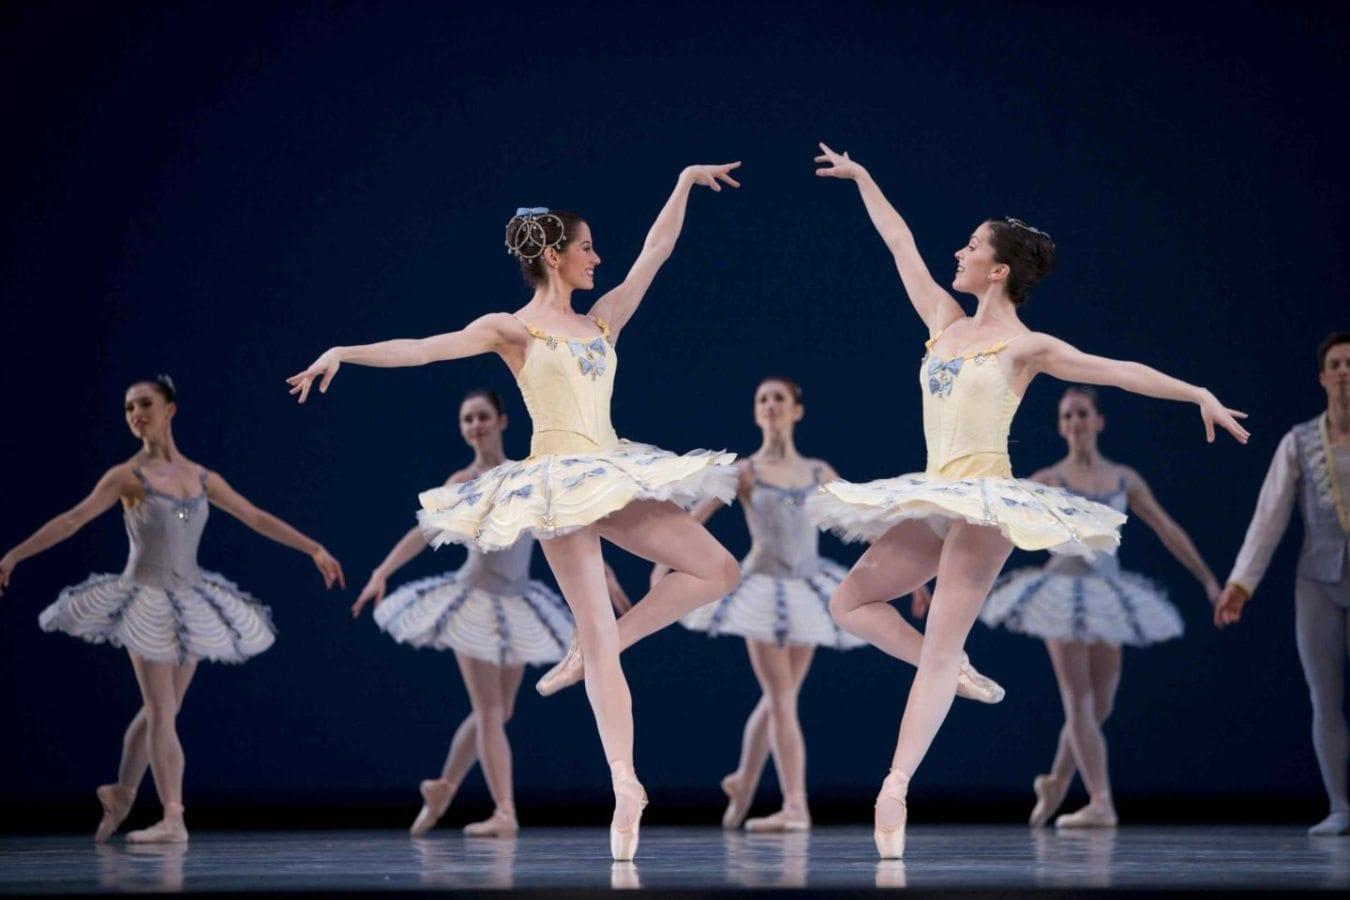 oslo ballettskole